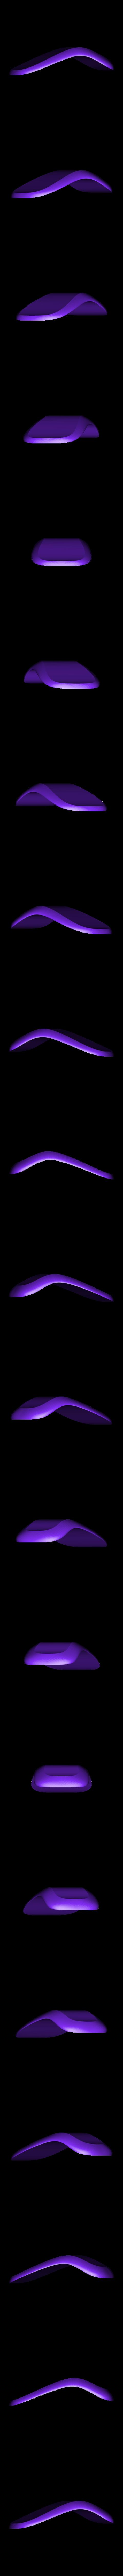 V3_mouse_detail.STL Download free STL file Multi-Color Computer Mouse Model: Industrial/Product Design • 3D printable model, MosaicManufacturing